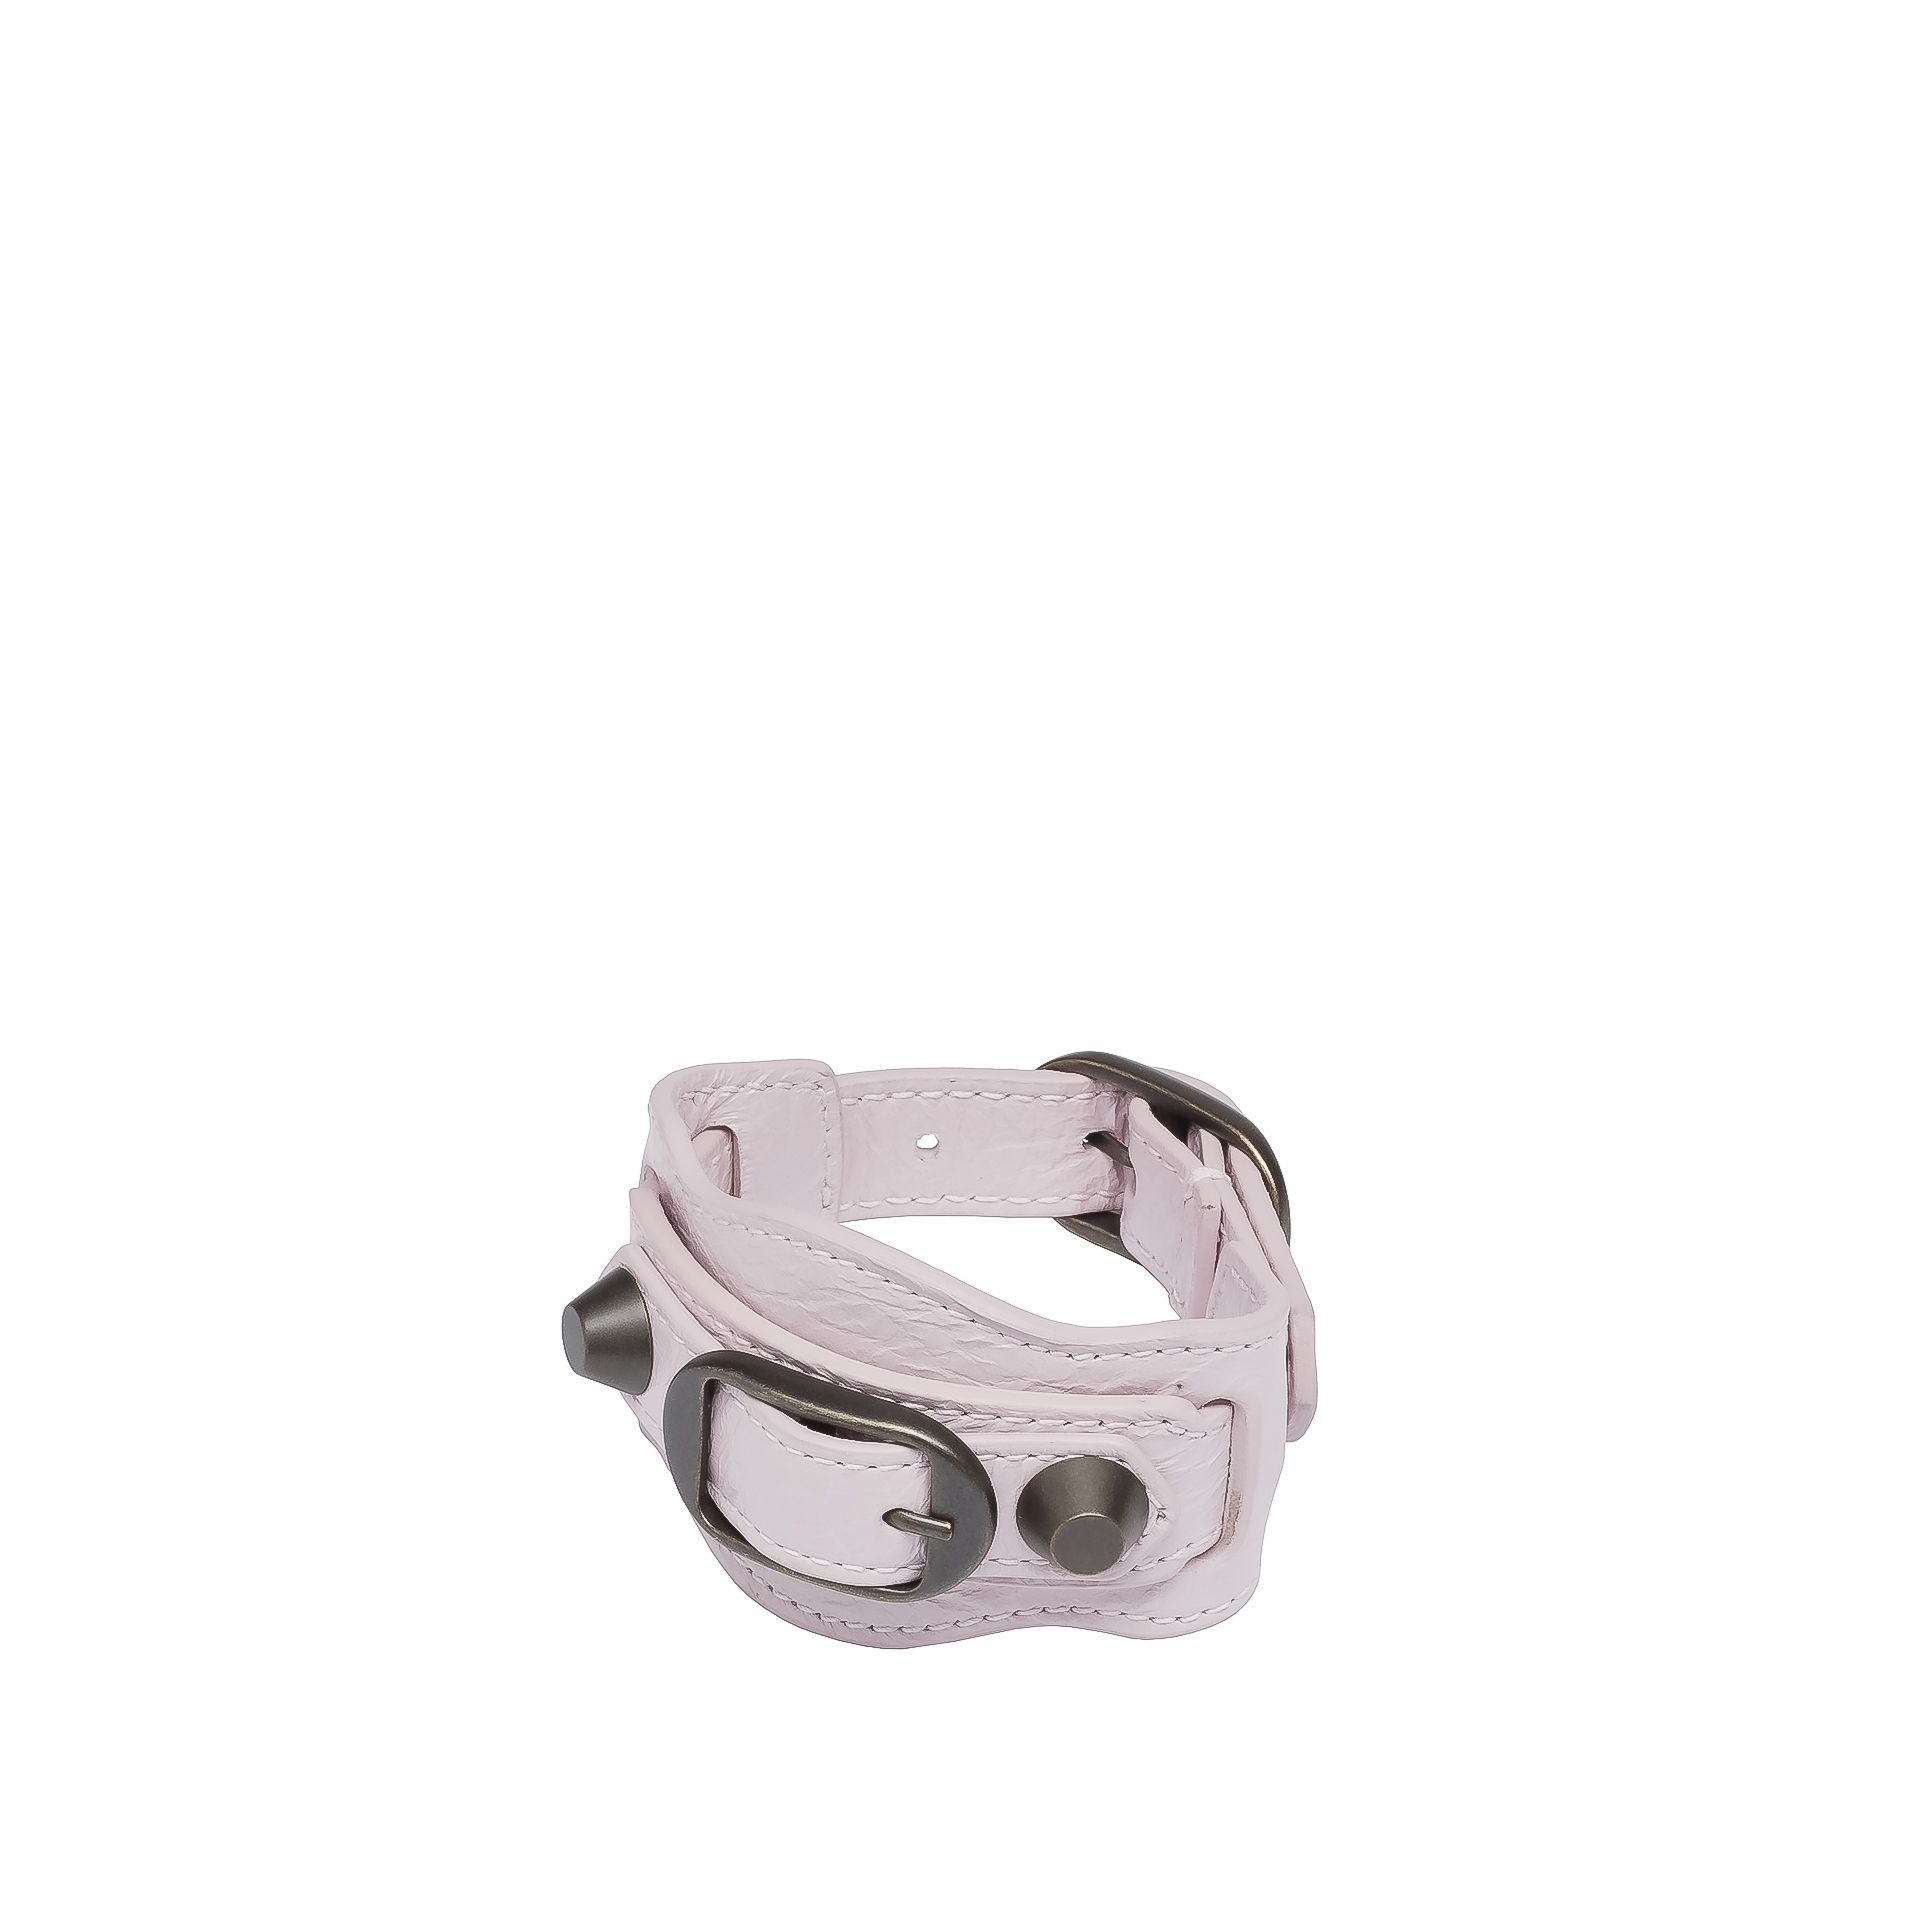 BALENCIAGA Balenciaga Classic Bracelet Classic Bracelets D f